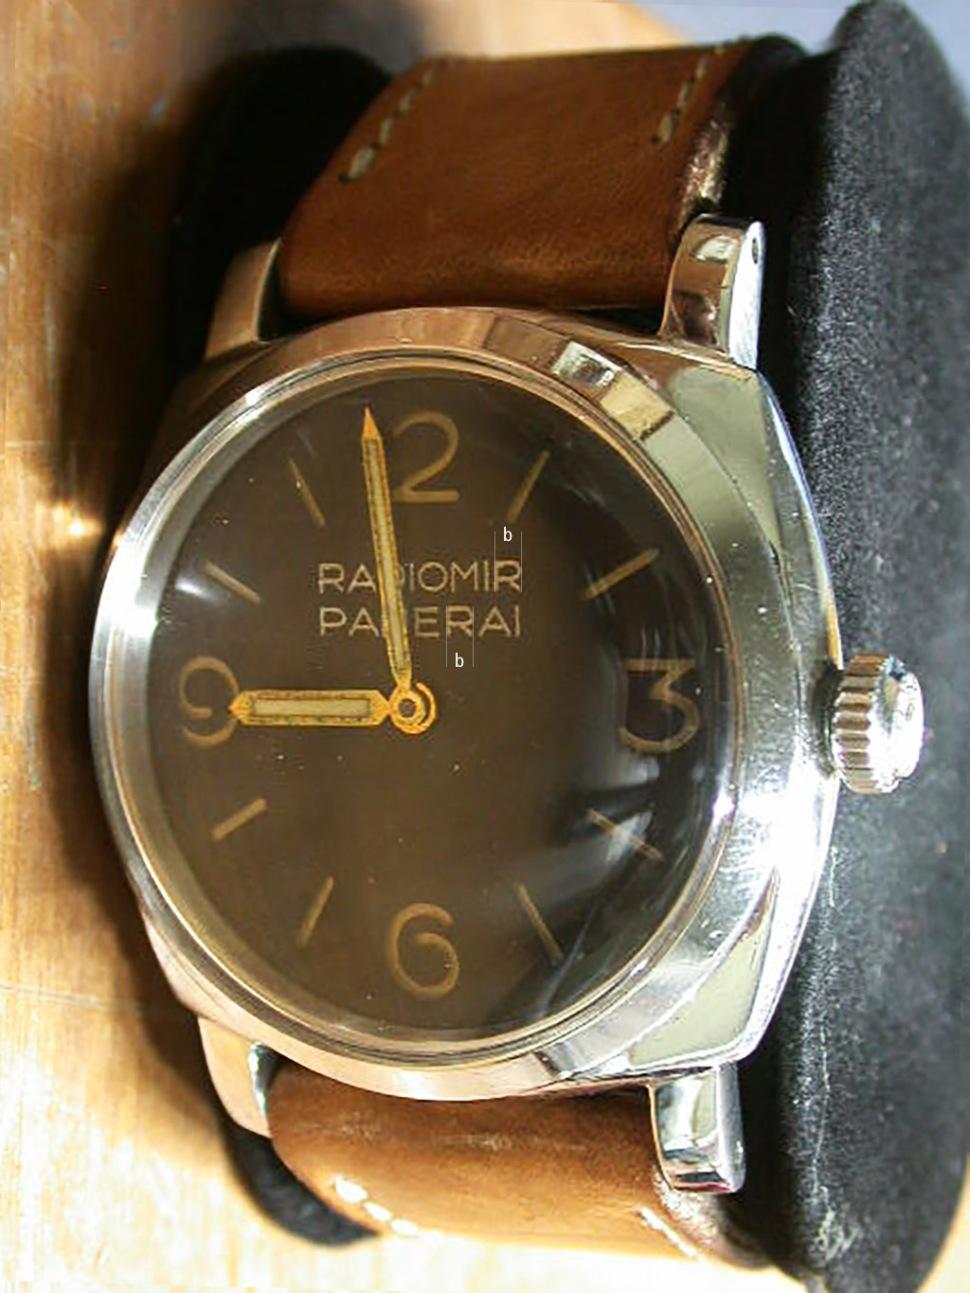 180912-panerai-6152-1-radiomir-kampschwimmer-dial-fake-rinaldi-engravings